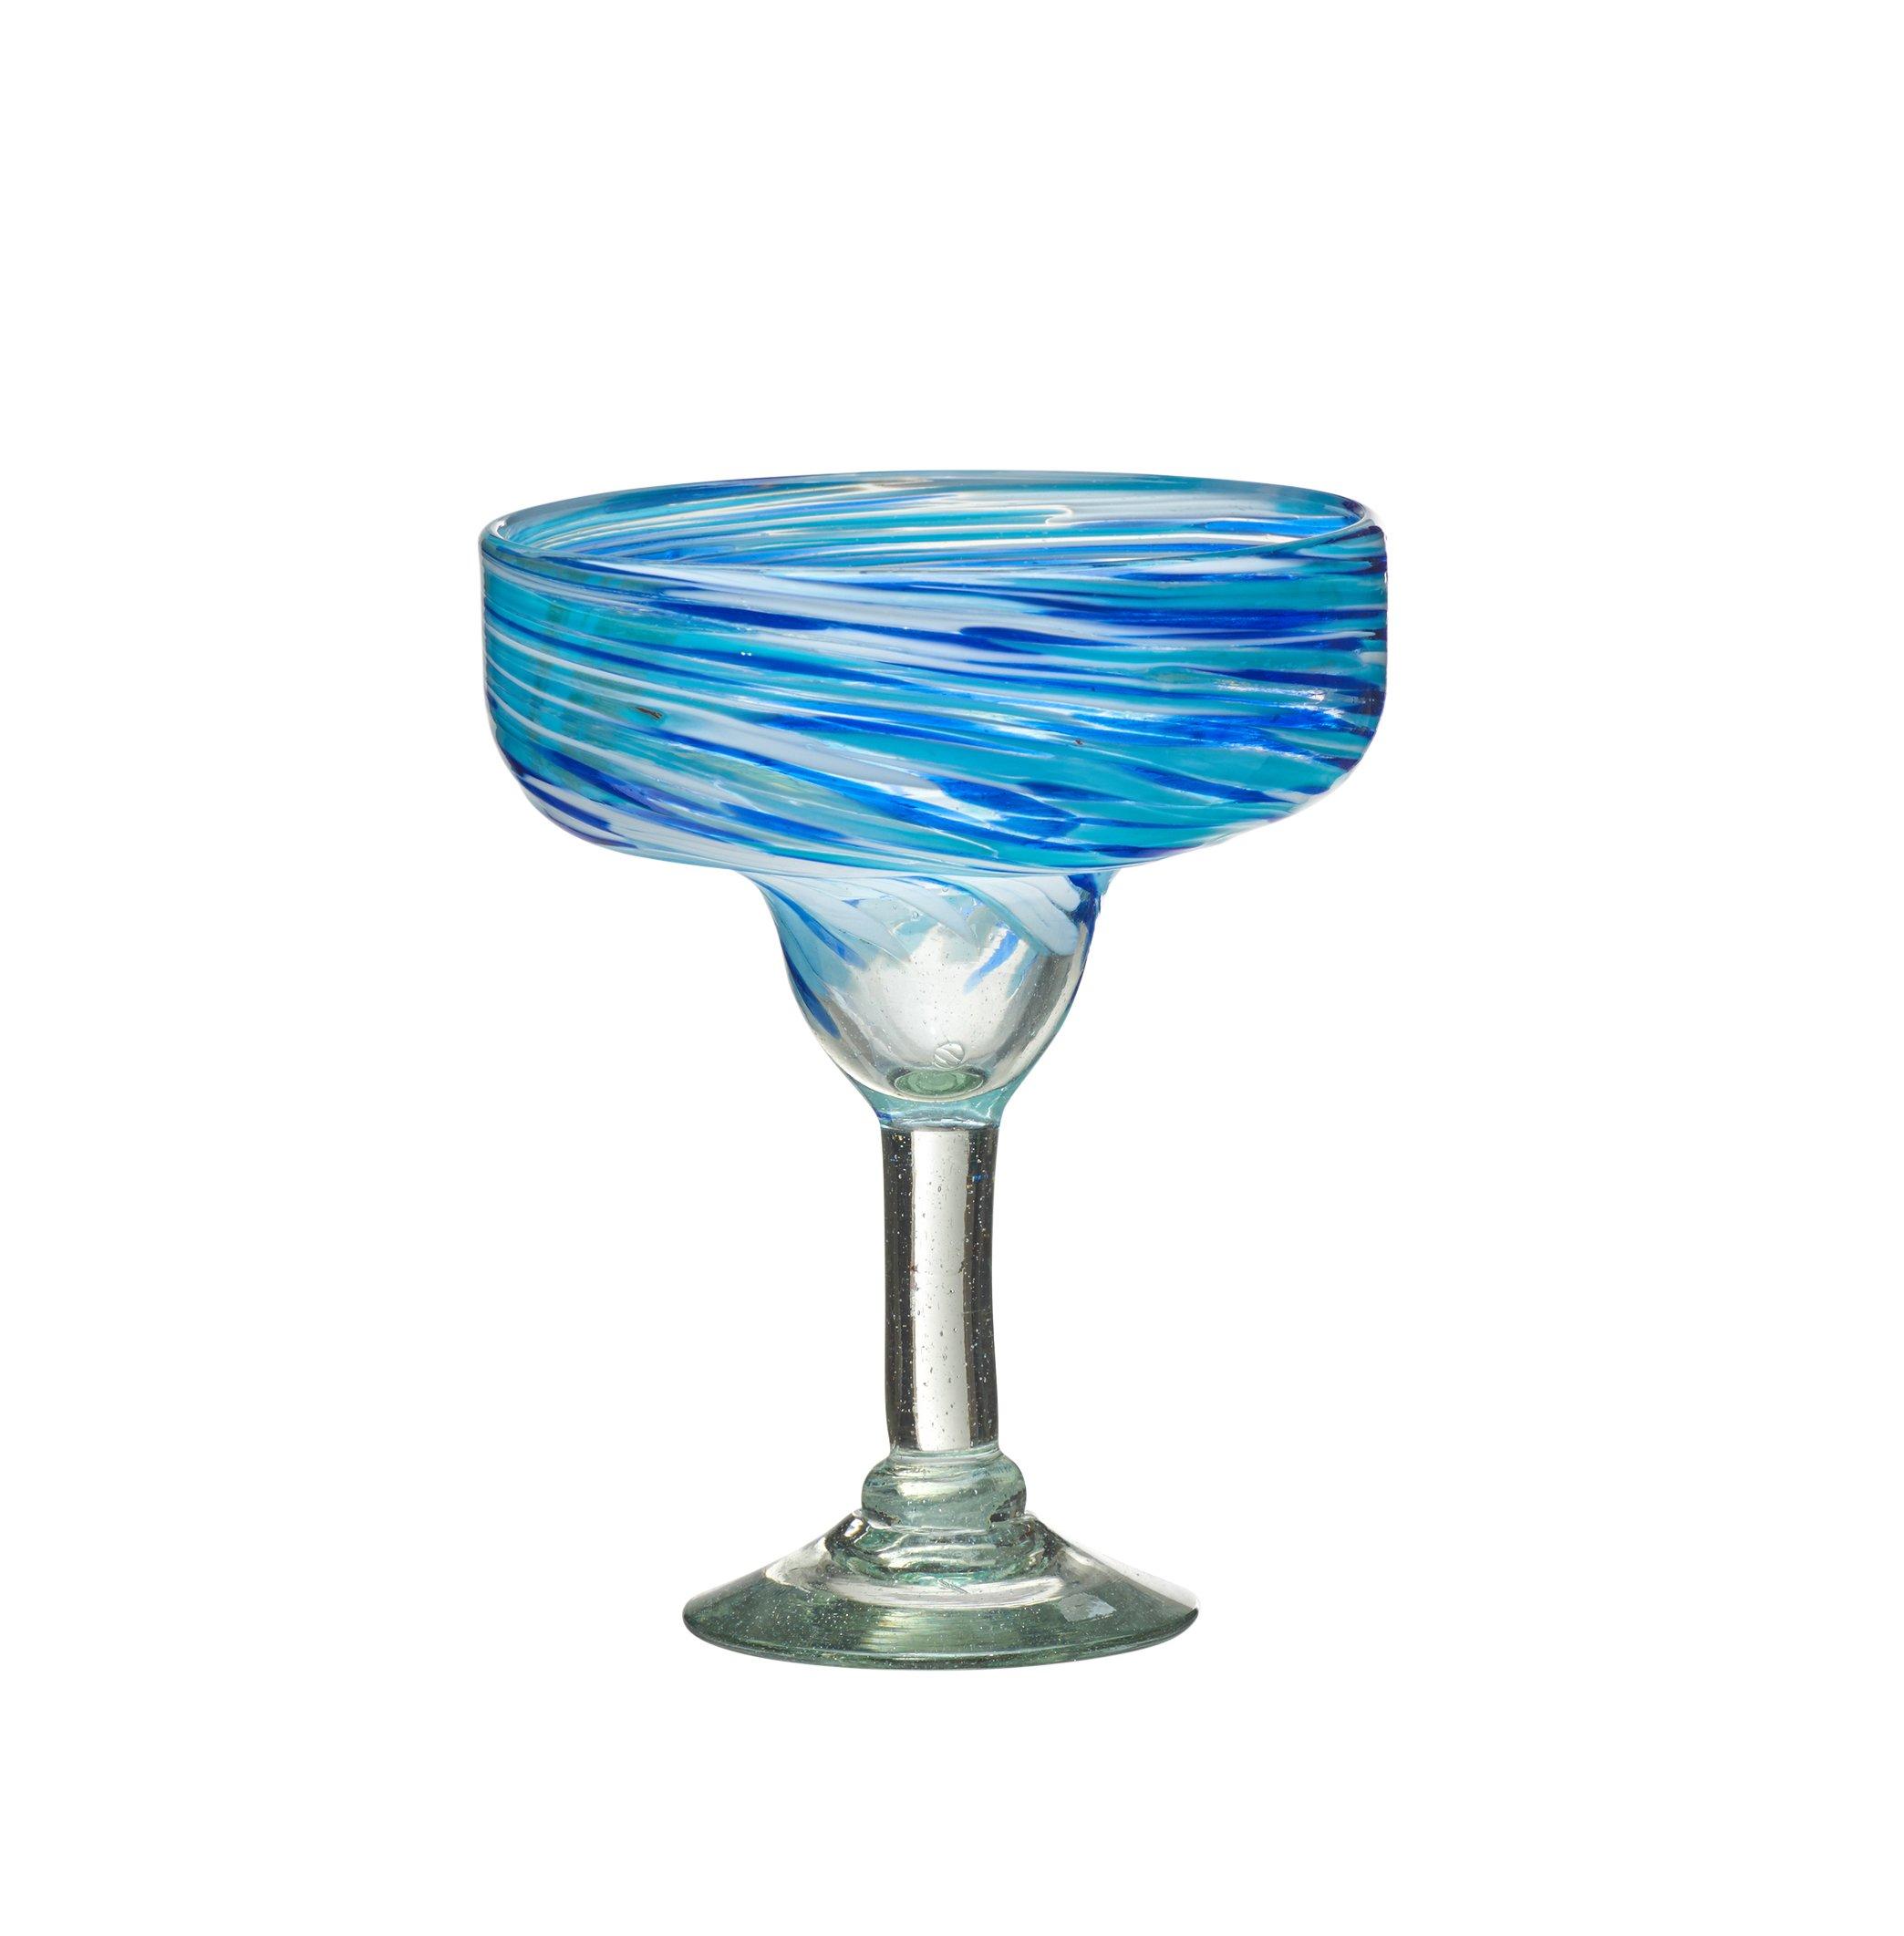 Amici Malibu Collection Margarita Glass - Set of 4